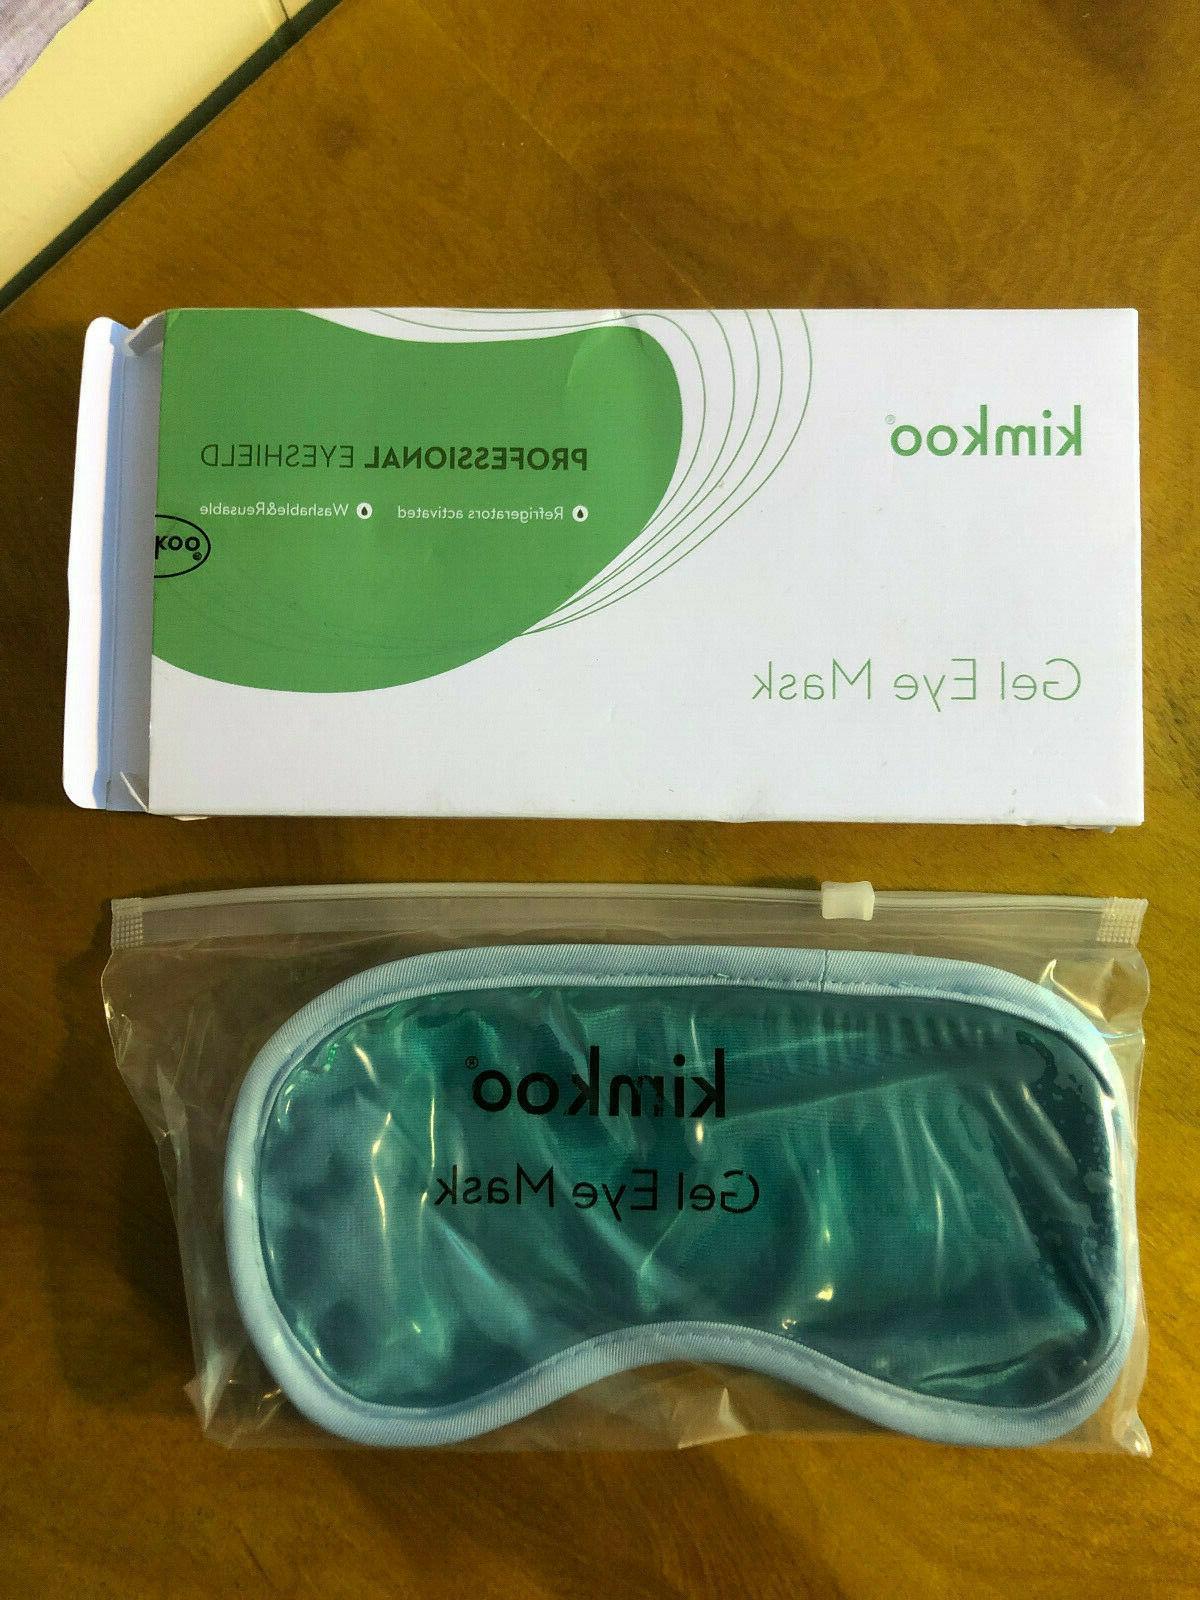 Kimkoo Gel Eye Mask Cold Pads&Cool Compress. Factory sealed